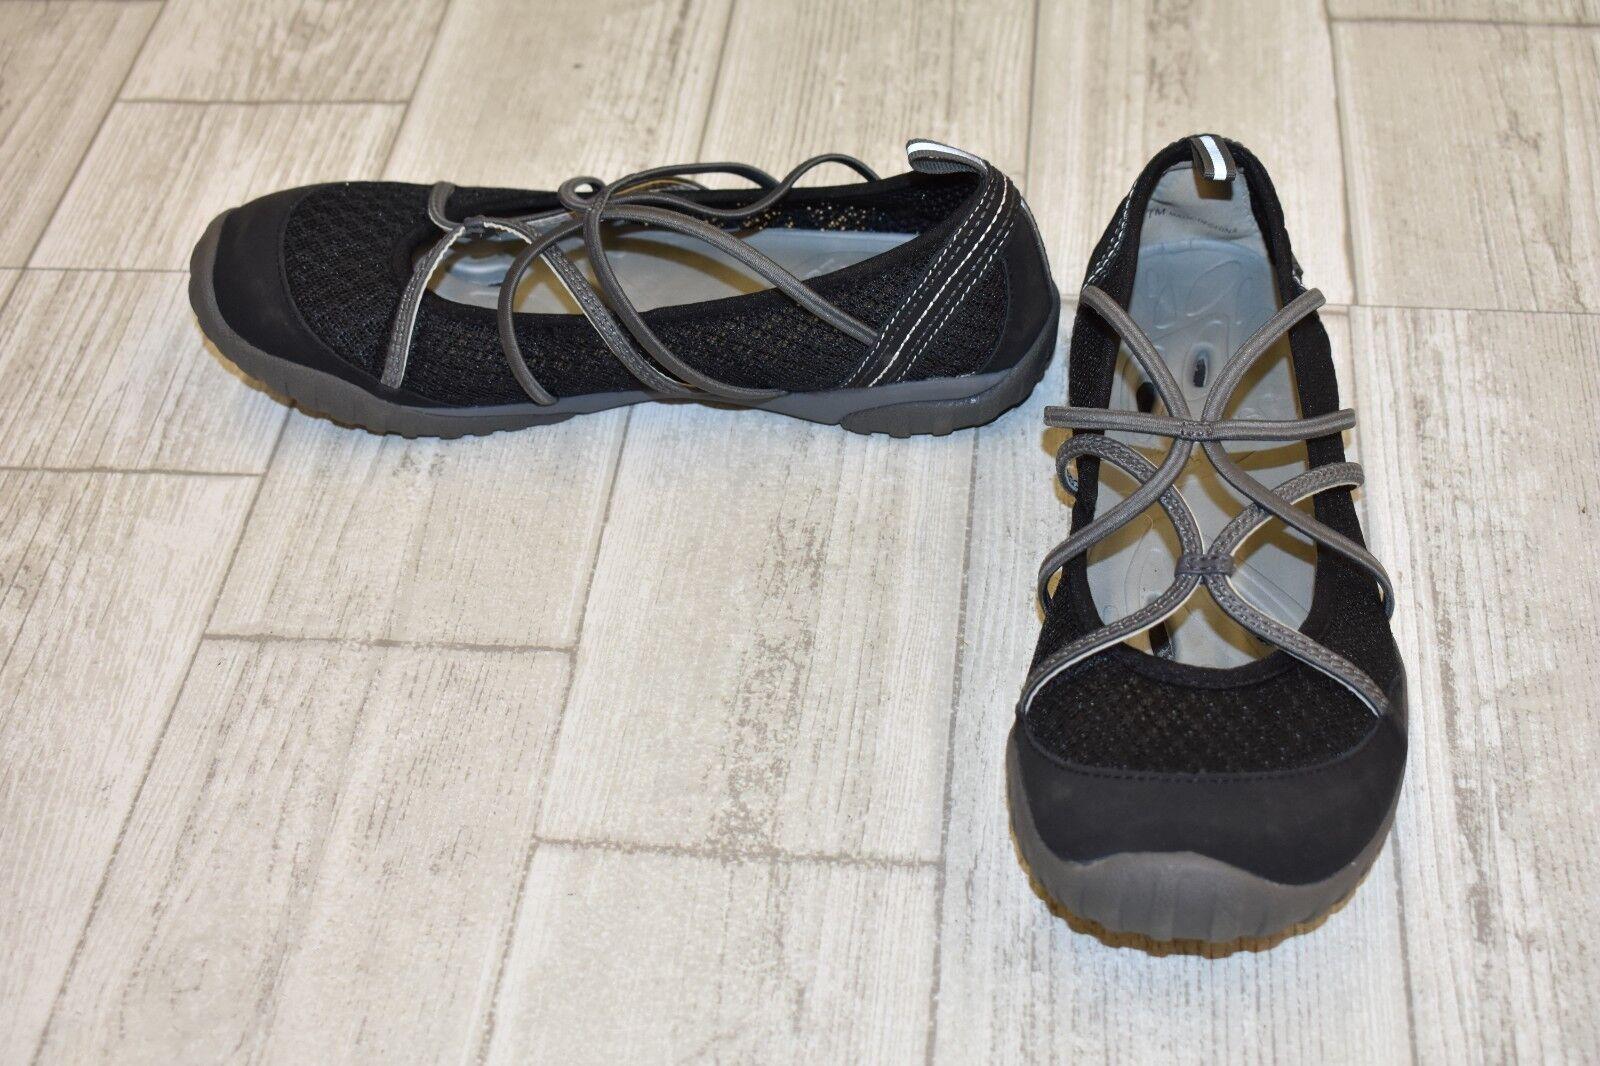 Jsport by Jambu Radiance - Water Ready shoes - Women's Size 7M - Black